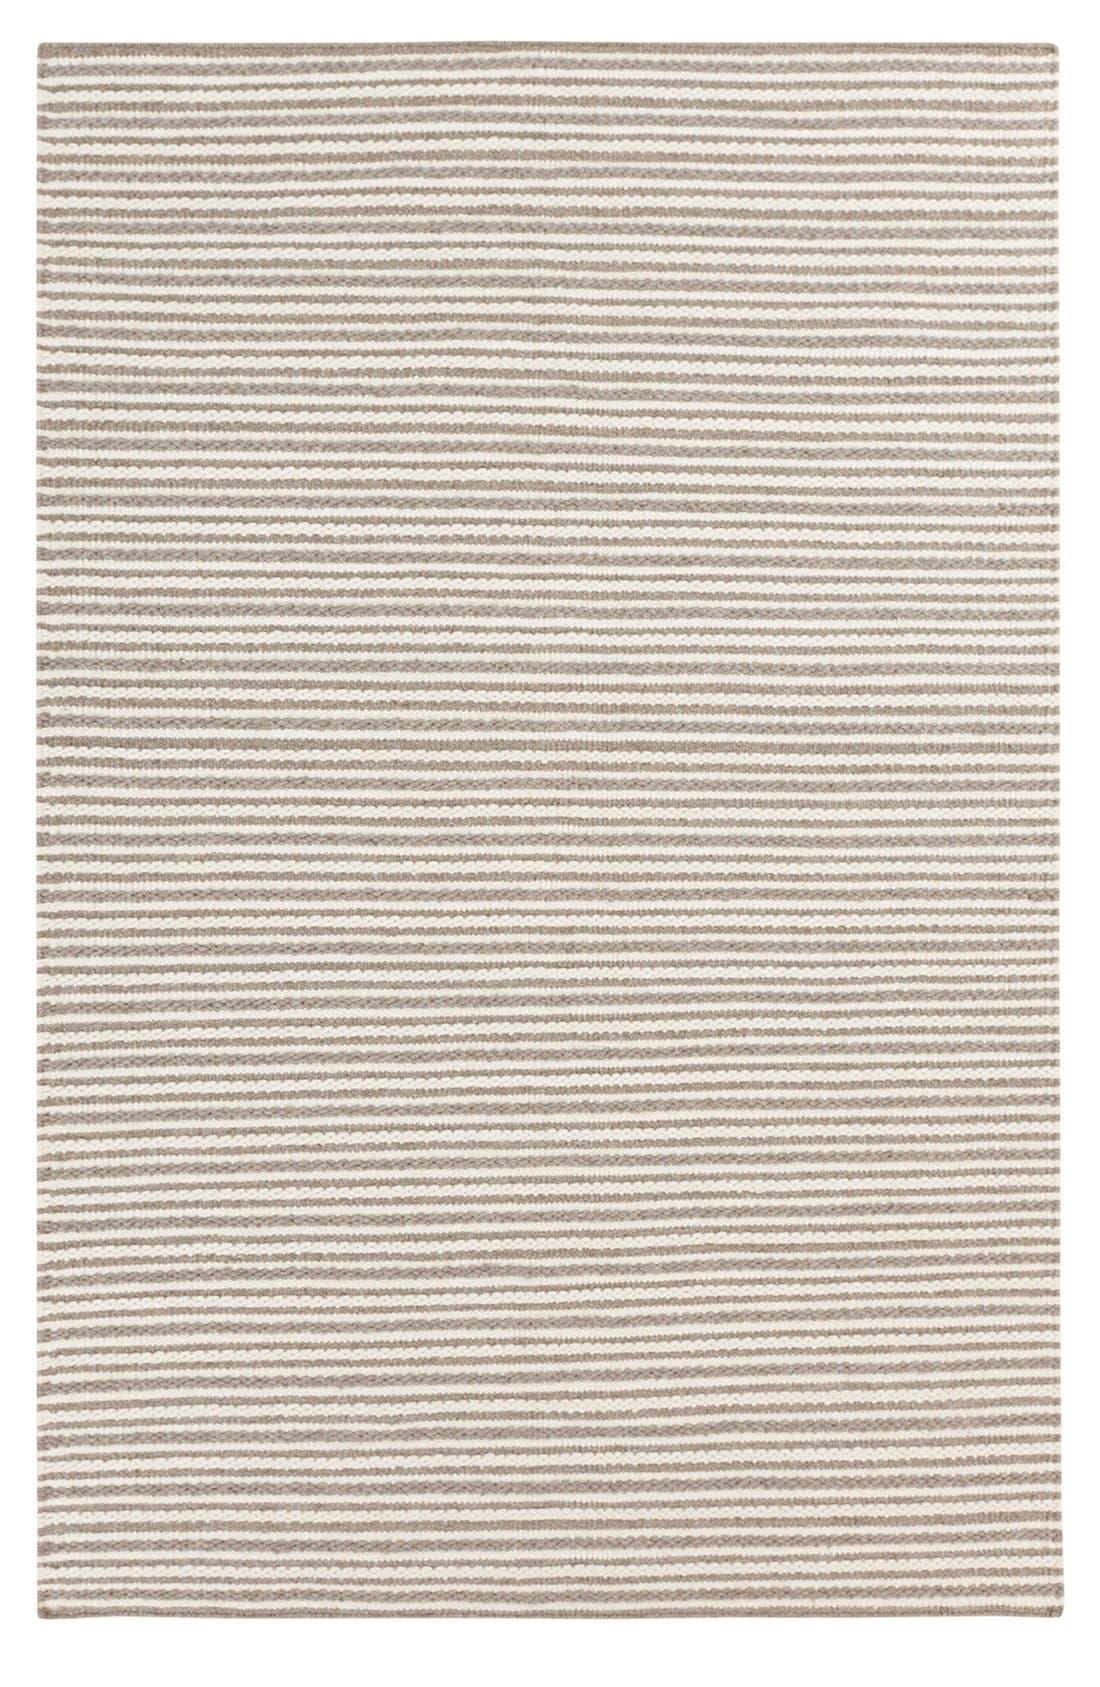 'Ravena' Wool Rug,                         Main,                         color, Ivory/ Taupe